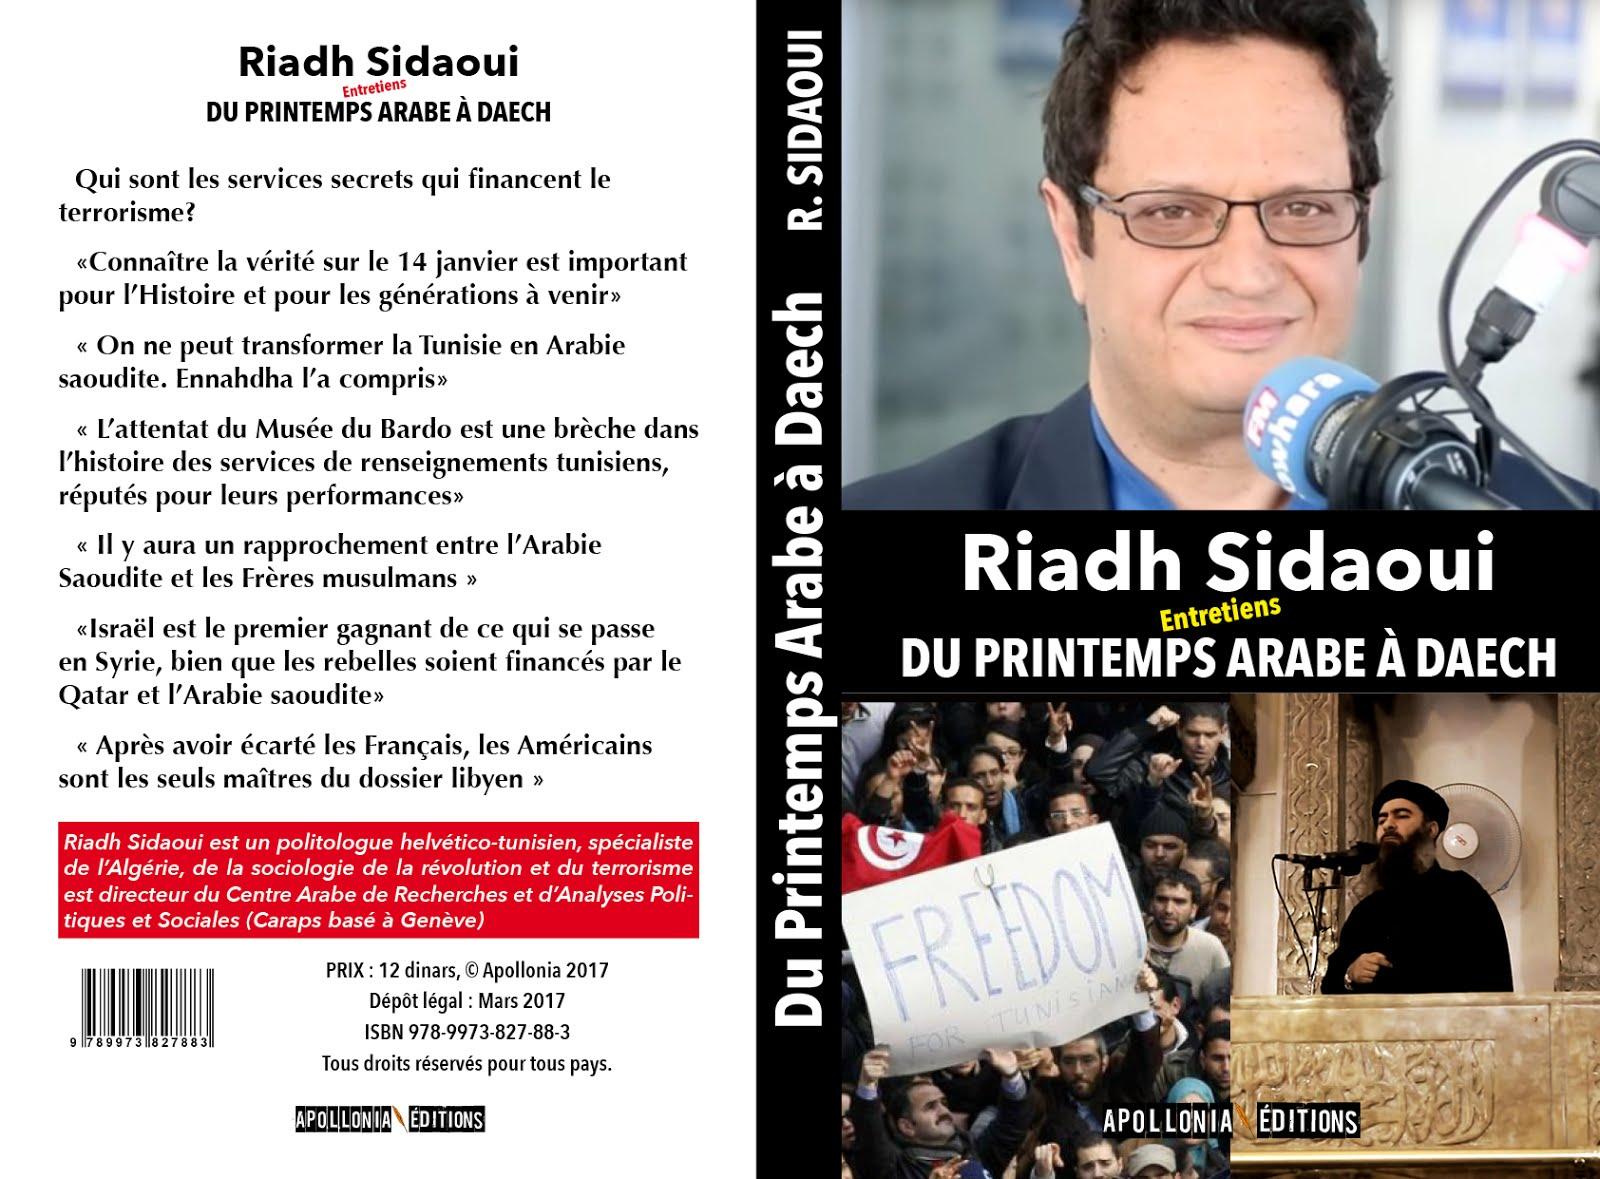 Riadh Sidaoui: Du Printemps Arabe à Daech : Entretiens